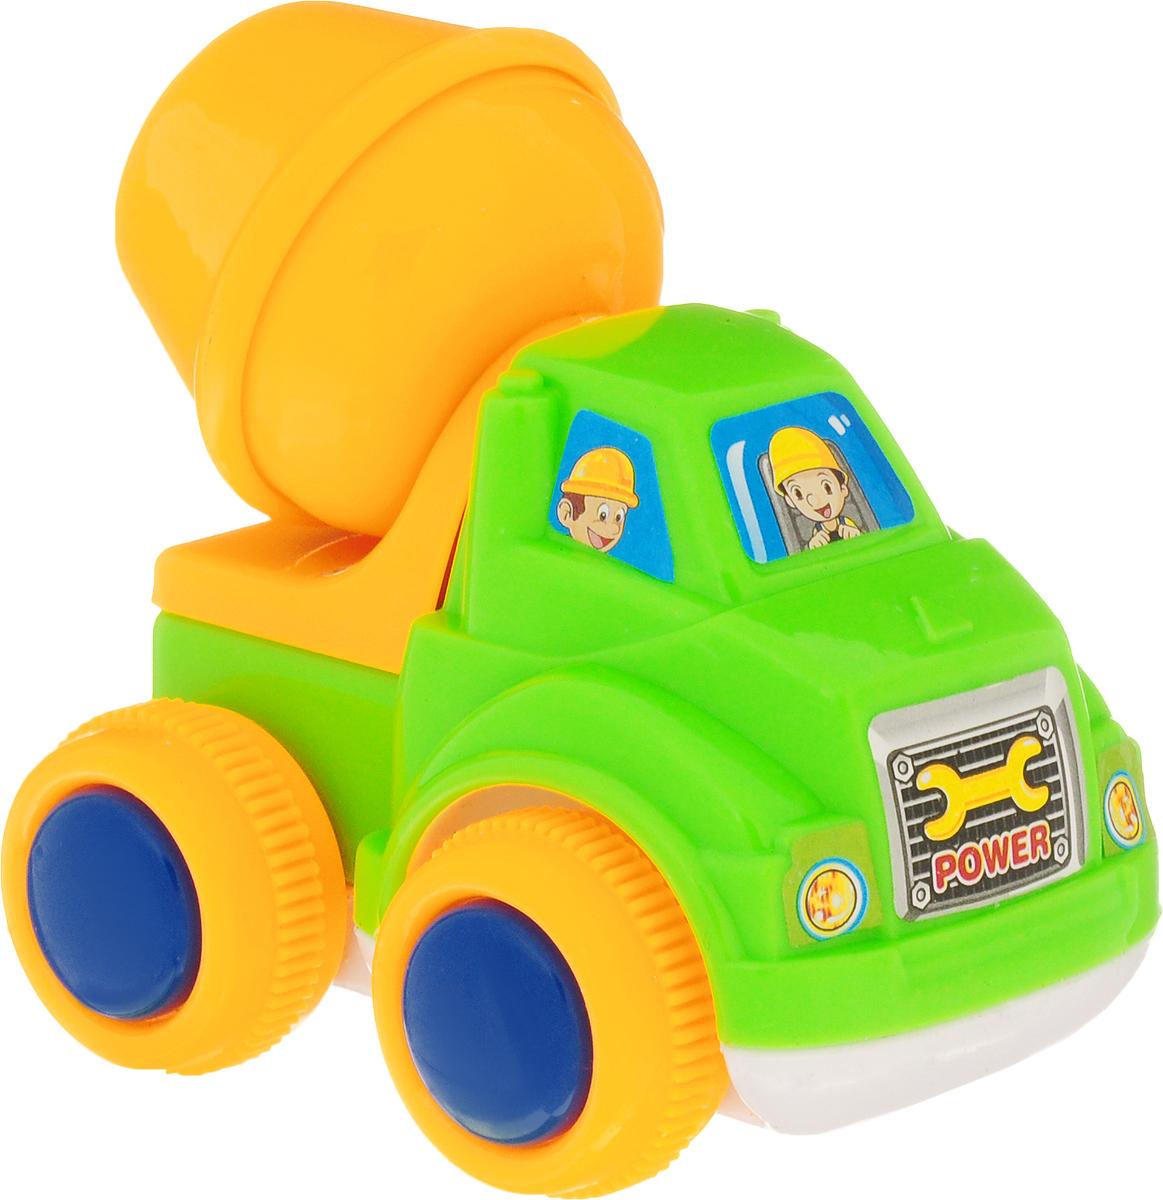 S+S Toys Бетономешалка инерционная s s toys набор для глажки